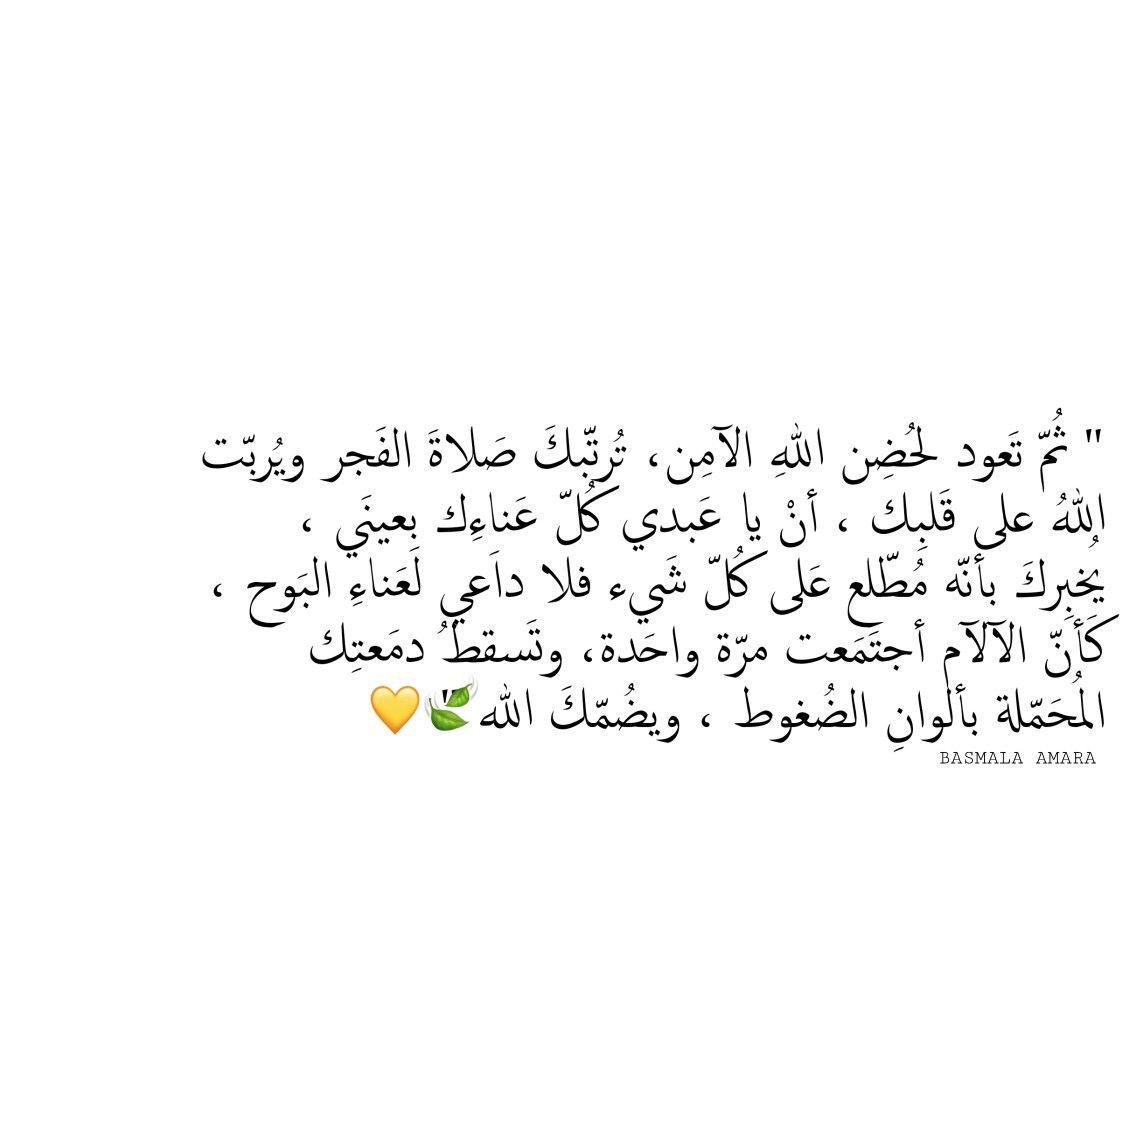 Pinterest Basmala Amara Basmala Quotes Islamic Qoutes